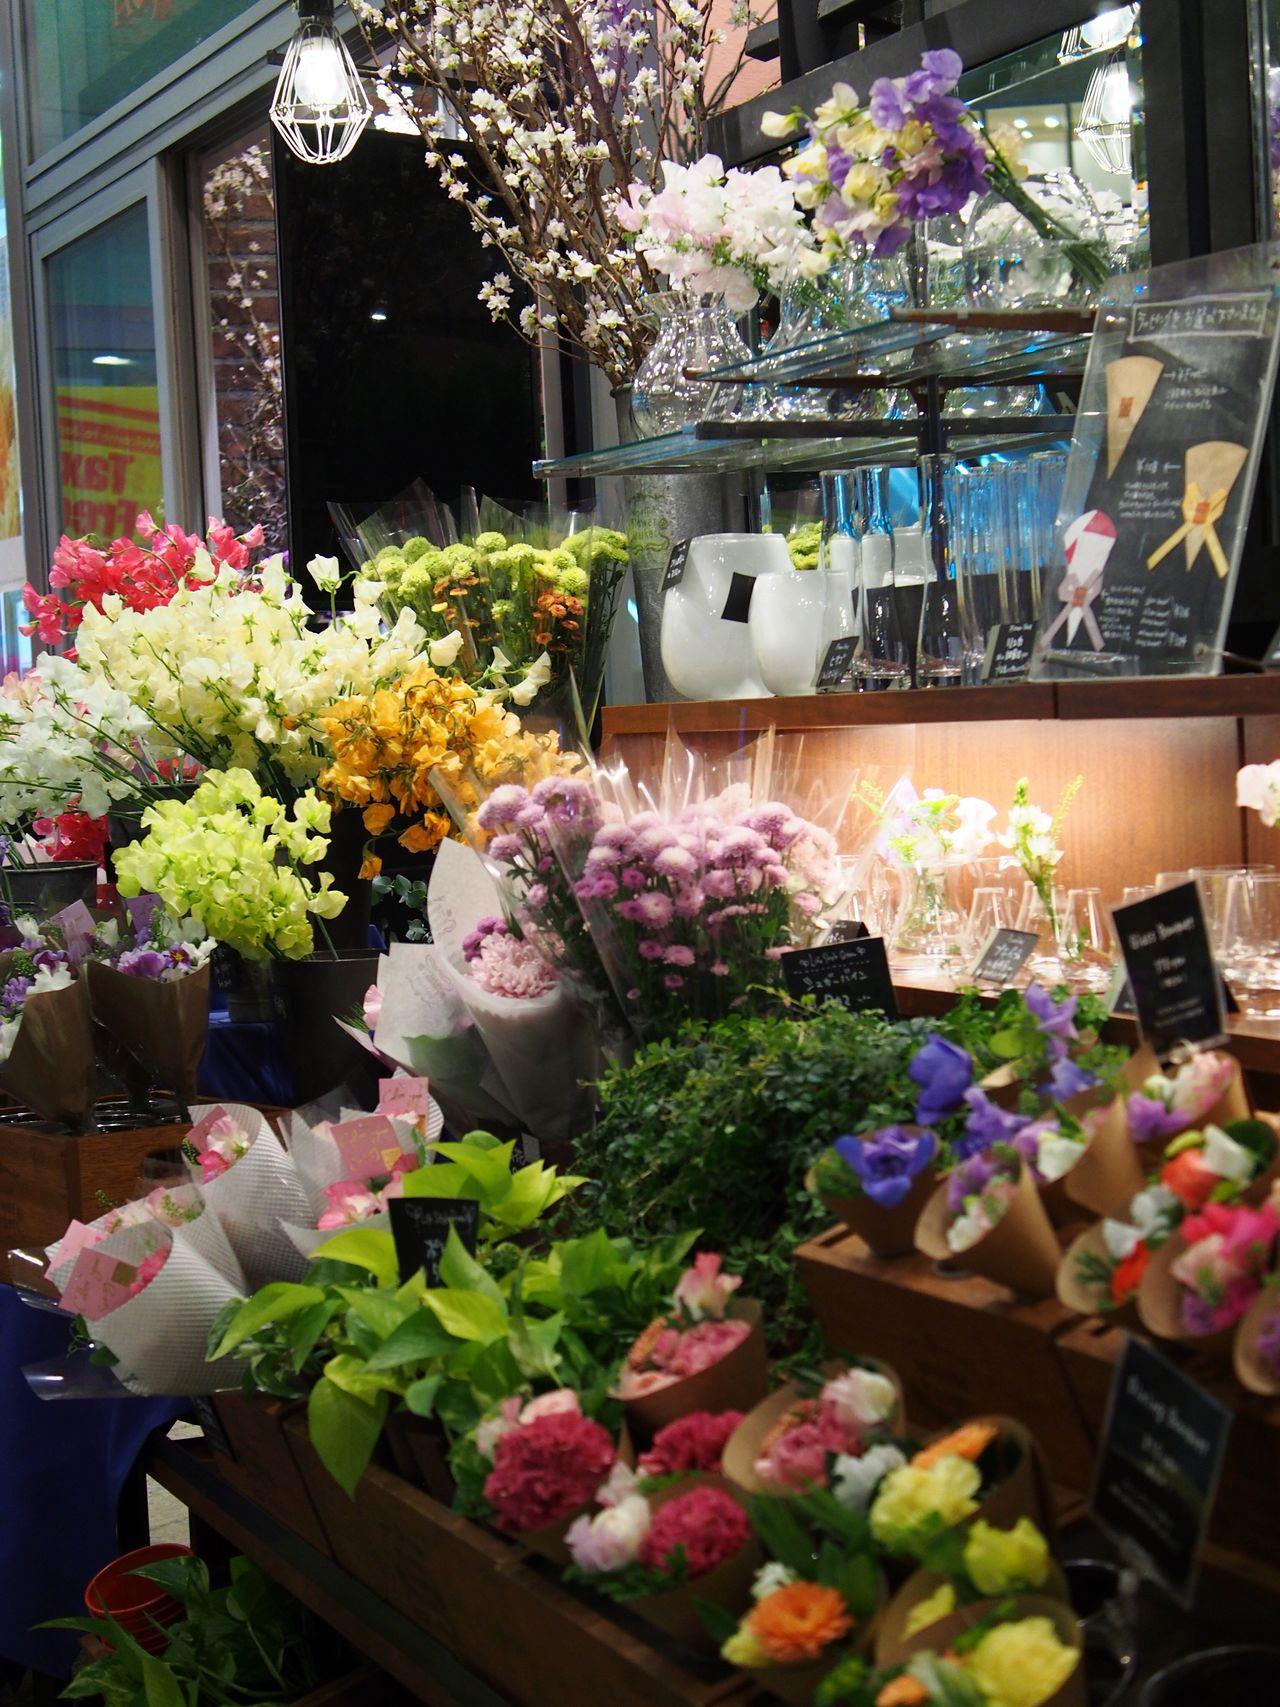 Flower Freshness Nature Flower Shop Retail  Variation Store Choice Market Multi Colored Beauty In Nature Plant Fragility For Sale Bouquet Flower Market Flower Head